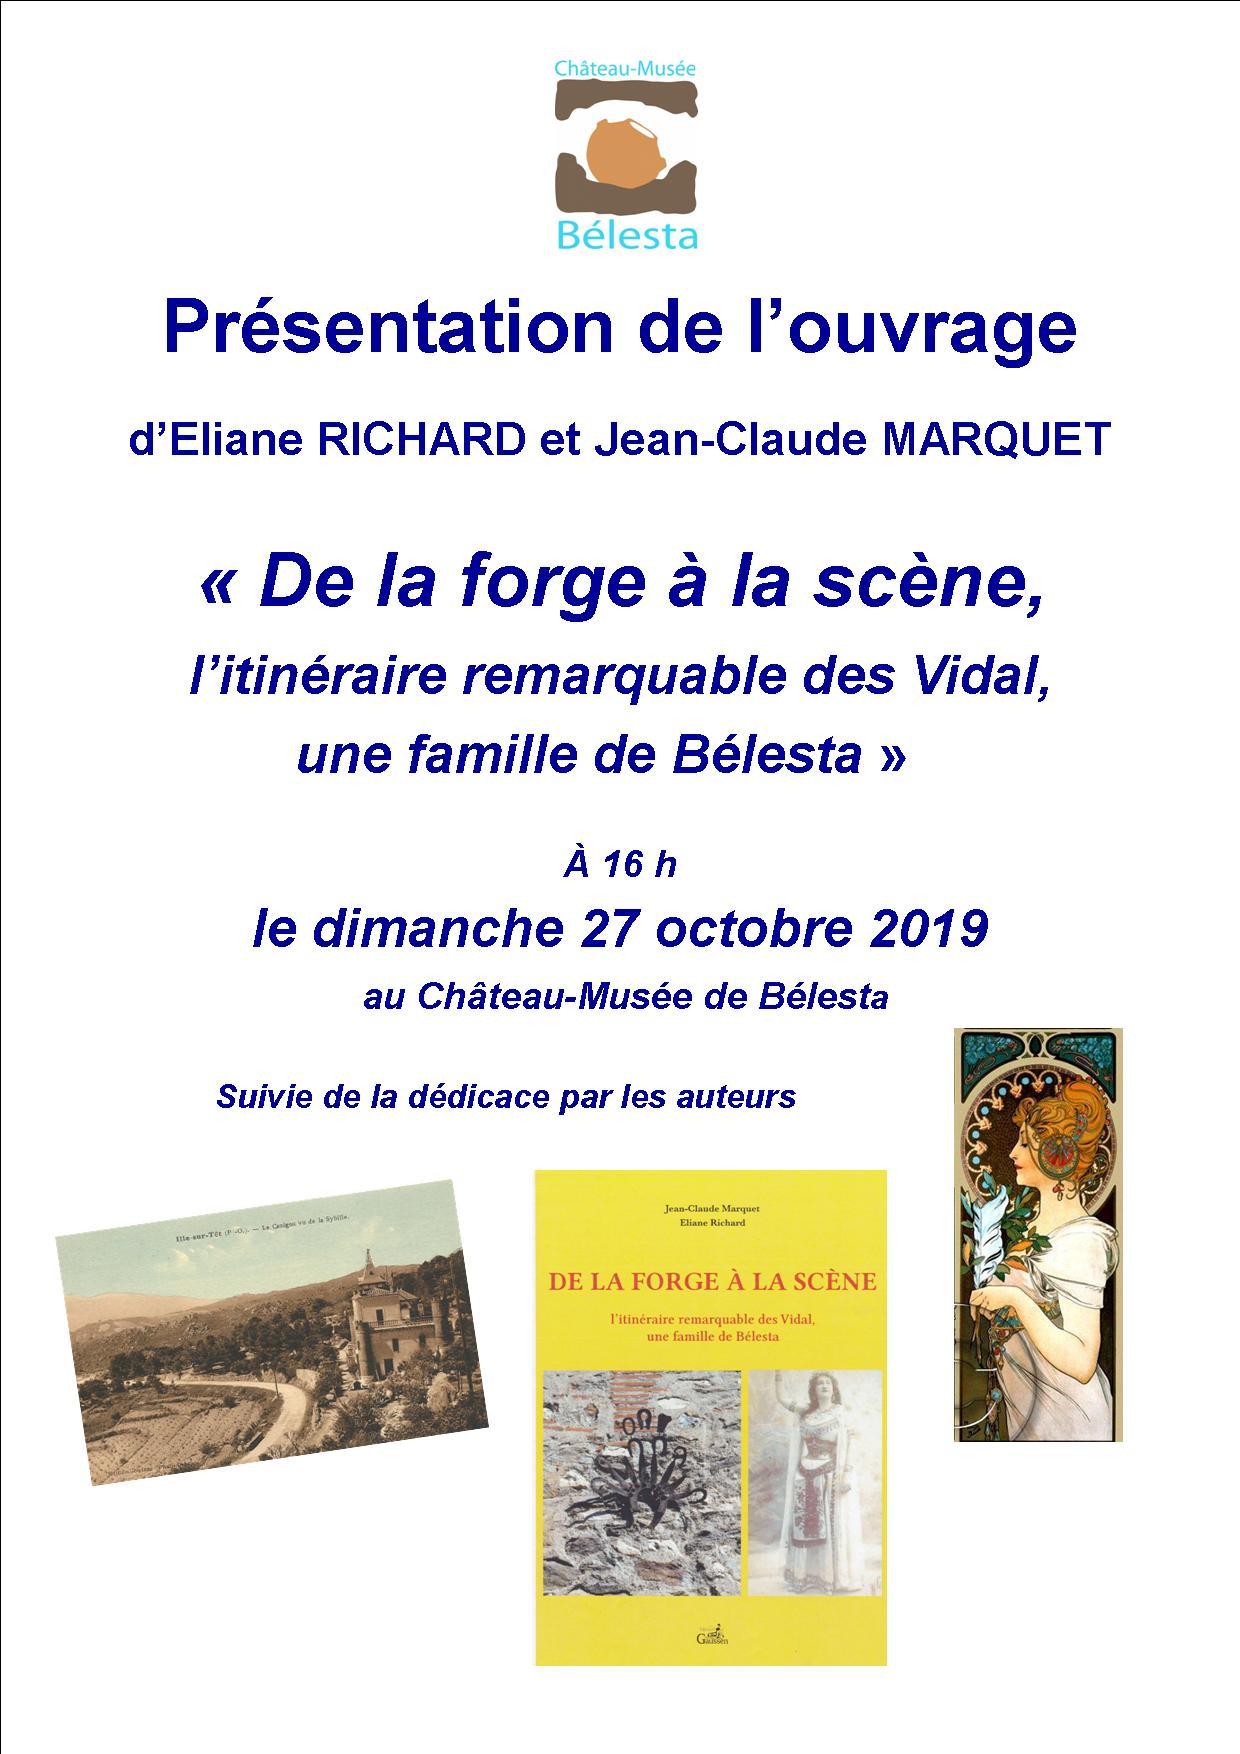 Affich. Livre Vidal  27 oct. 2019.jpg